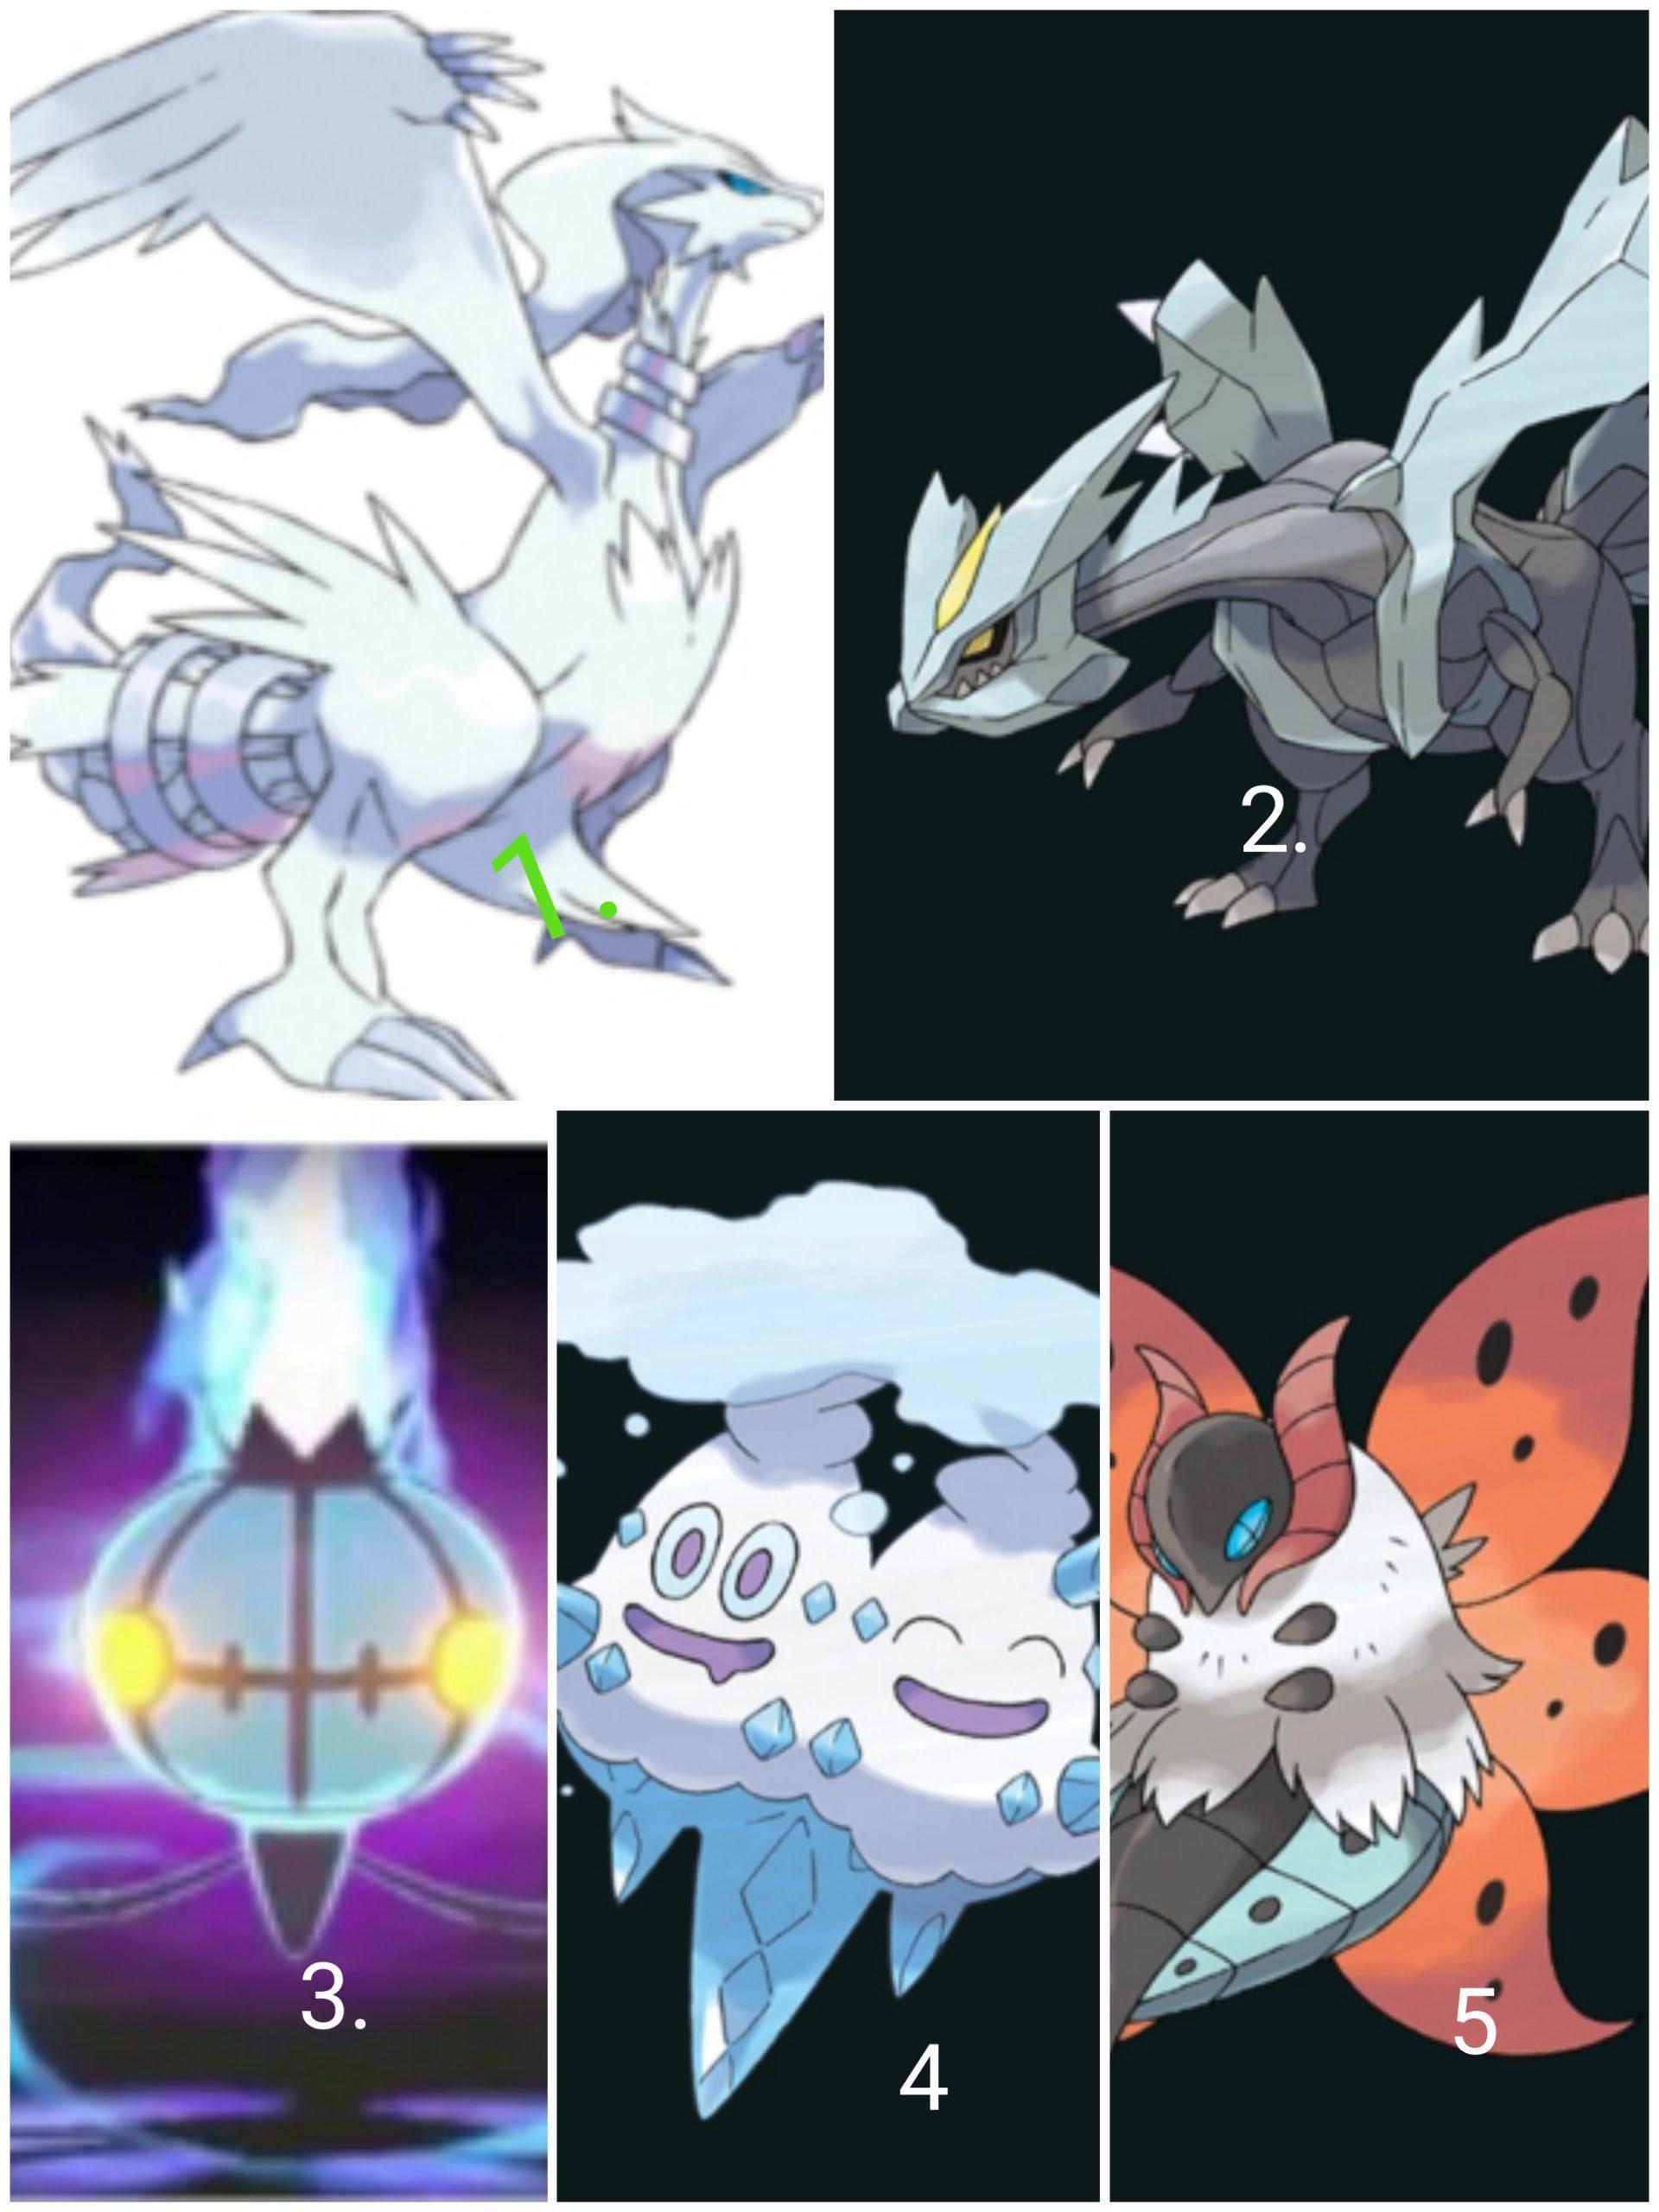 Top 5 Strong Pokemon in Black